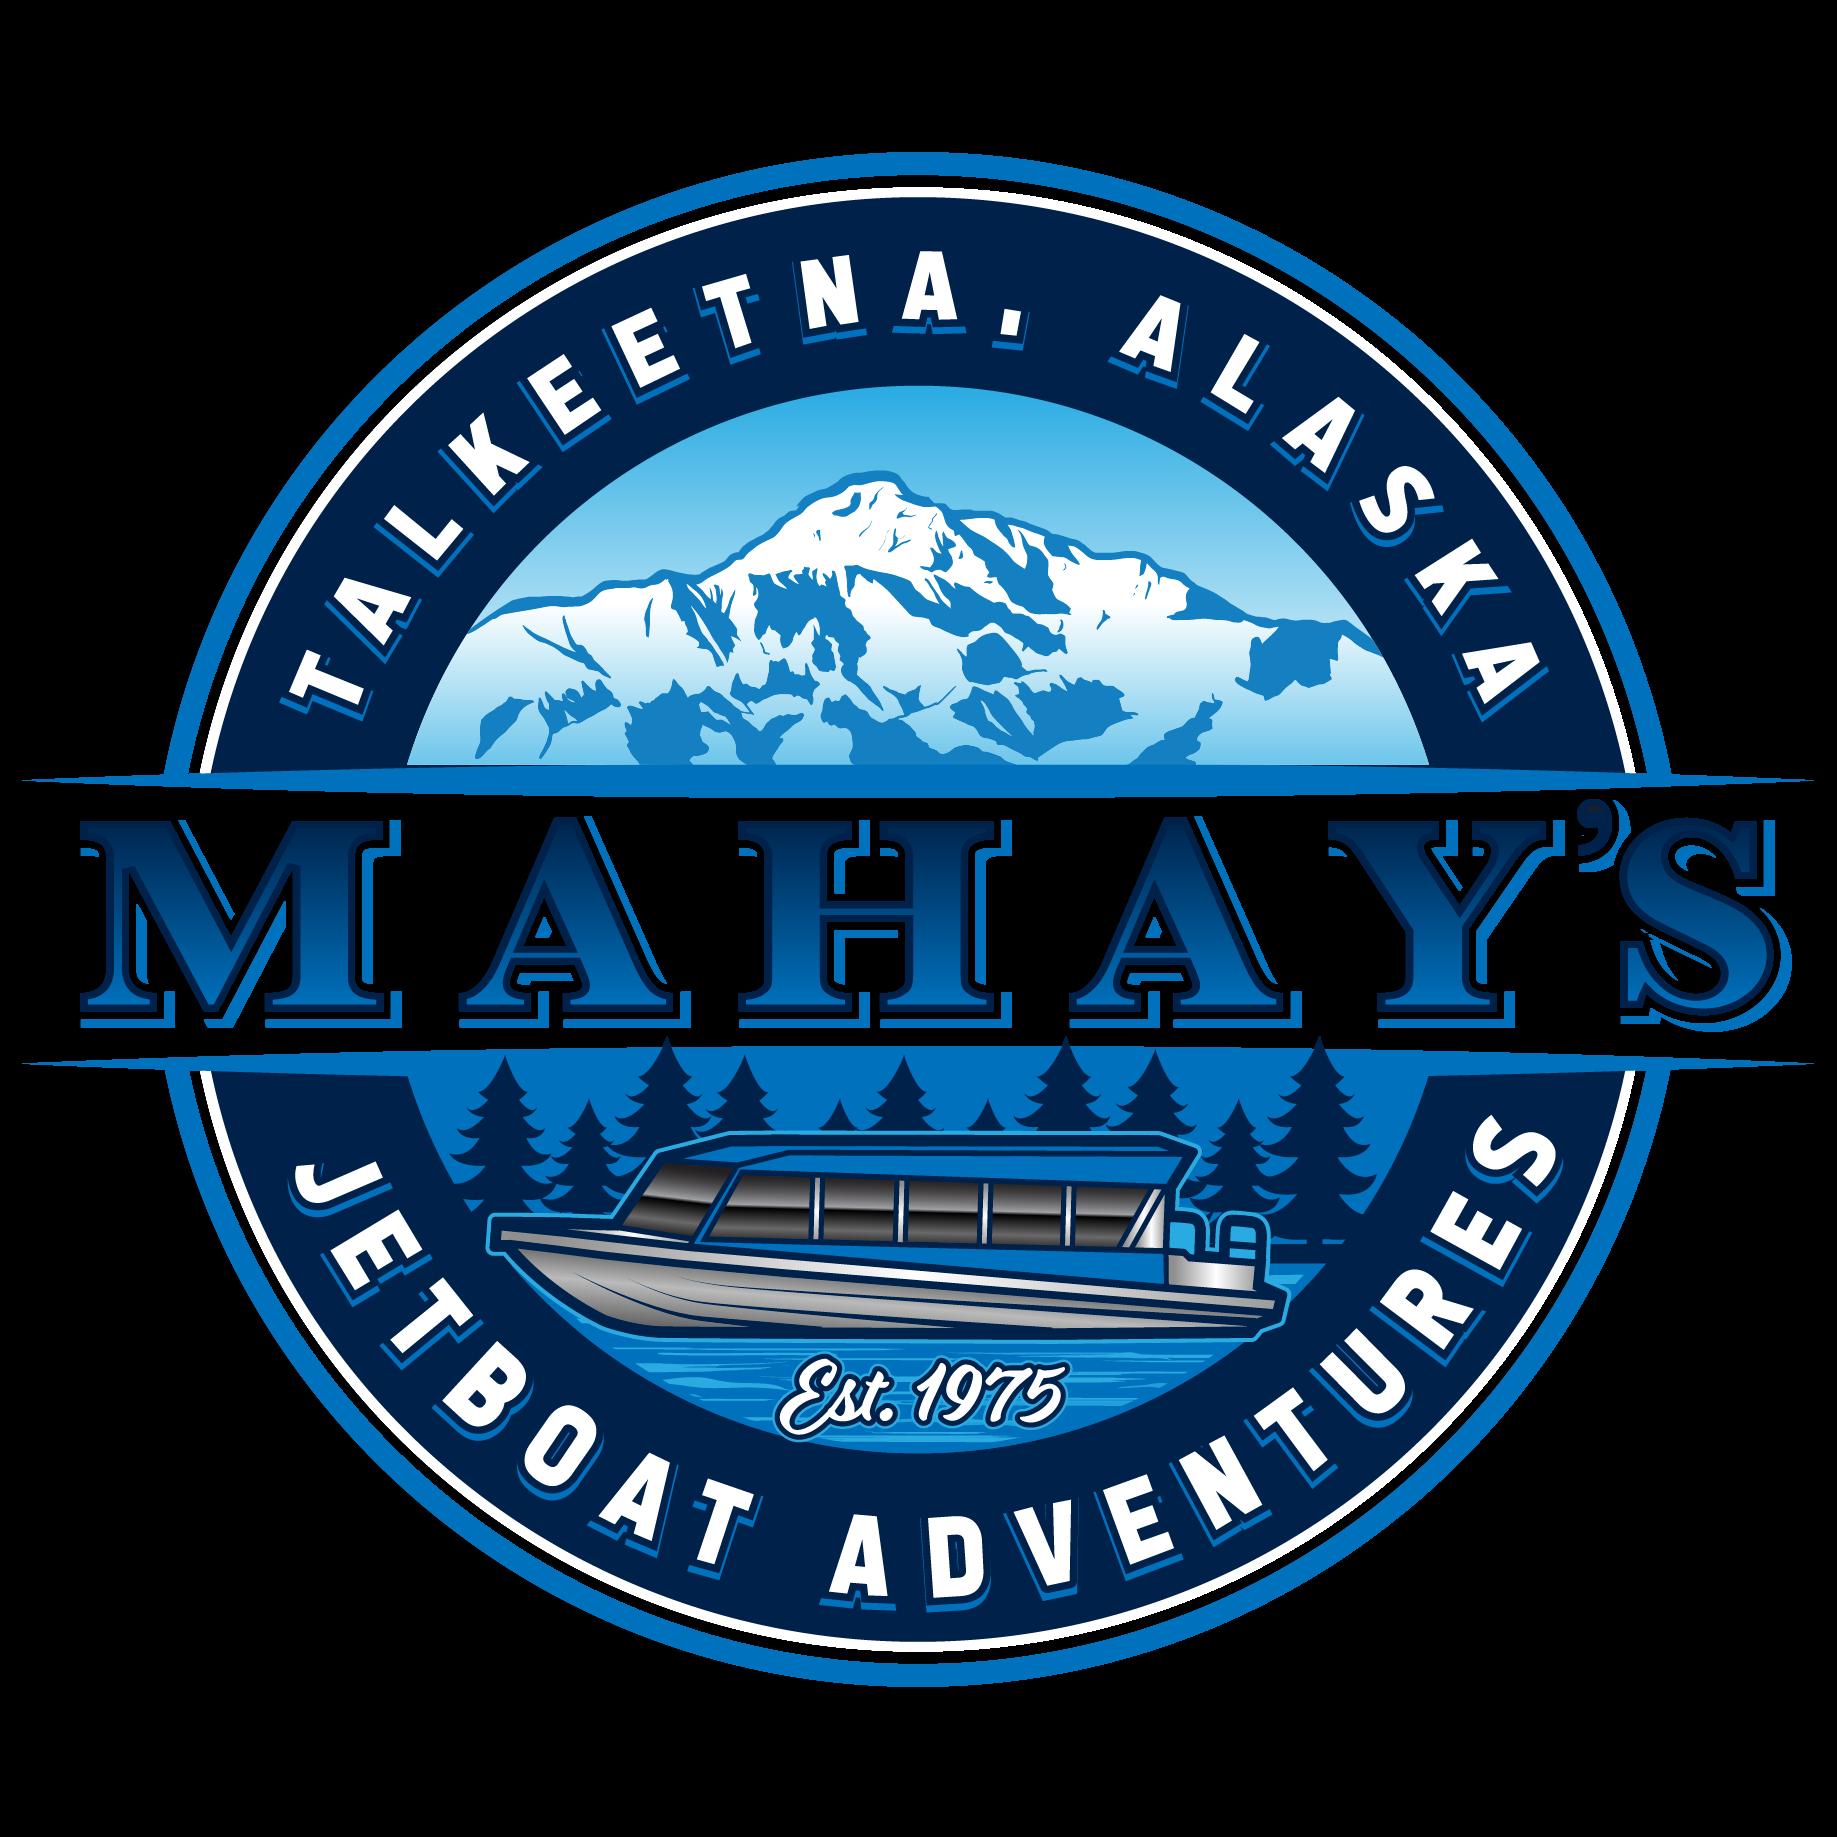 Jet Boat Adventures in Talkeetna, Alaska